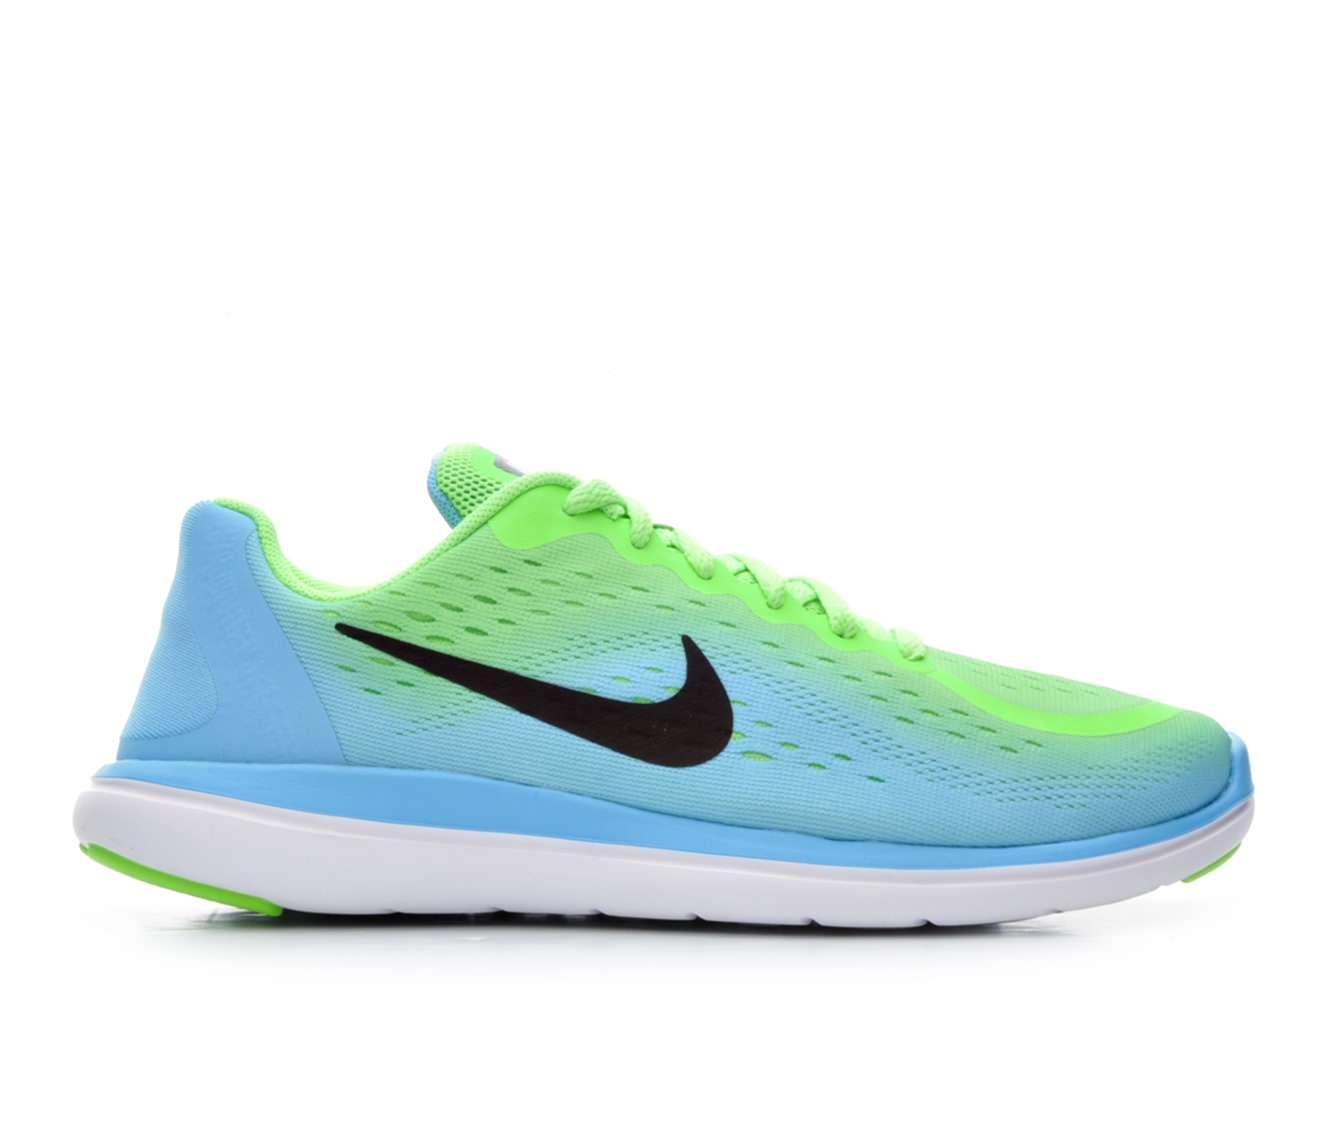 Girls' Nike Flex Run 2017 Running Shoes (Green)